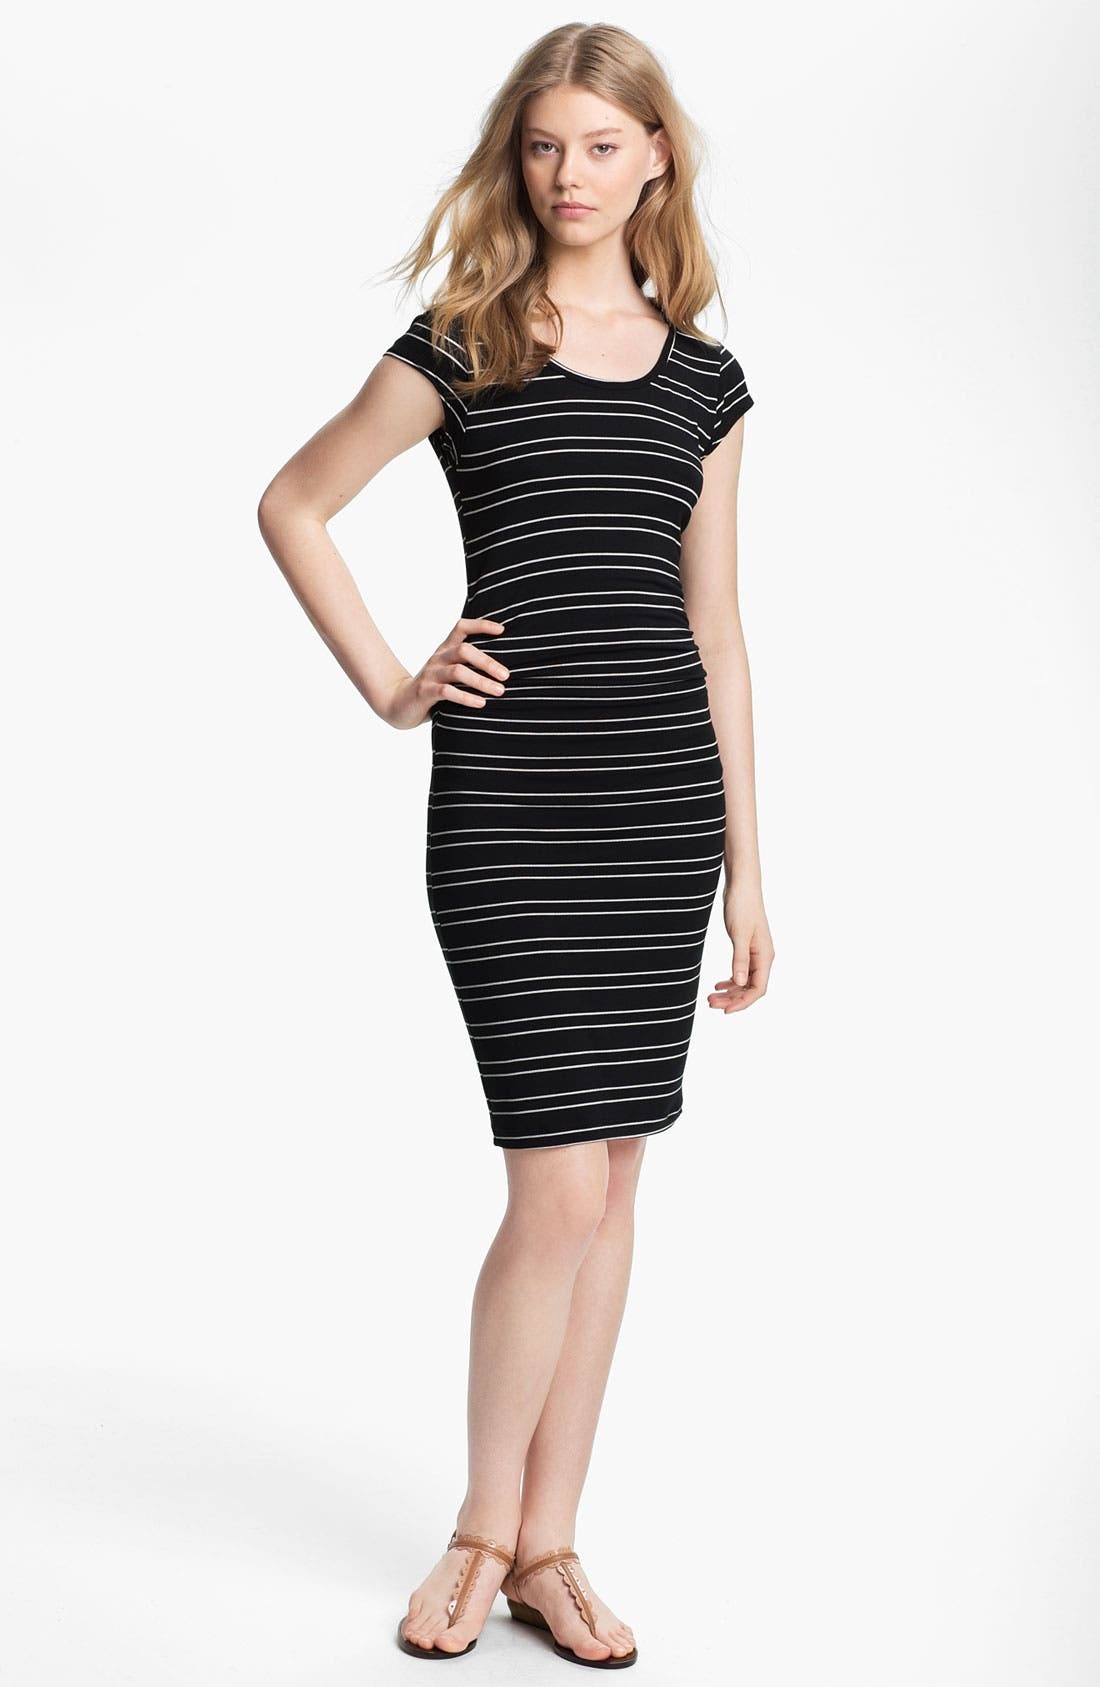 Alternate Image 1 Selected - Kain 'Ari' Stripe Jersey Dress